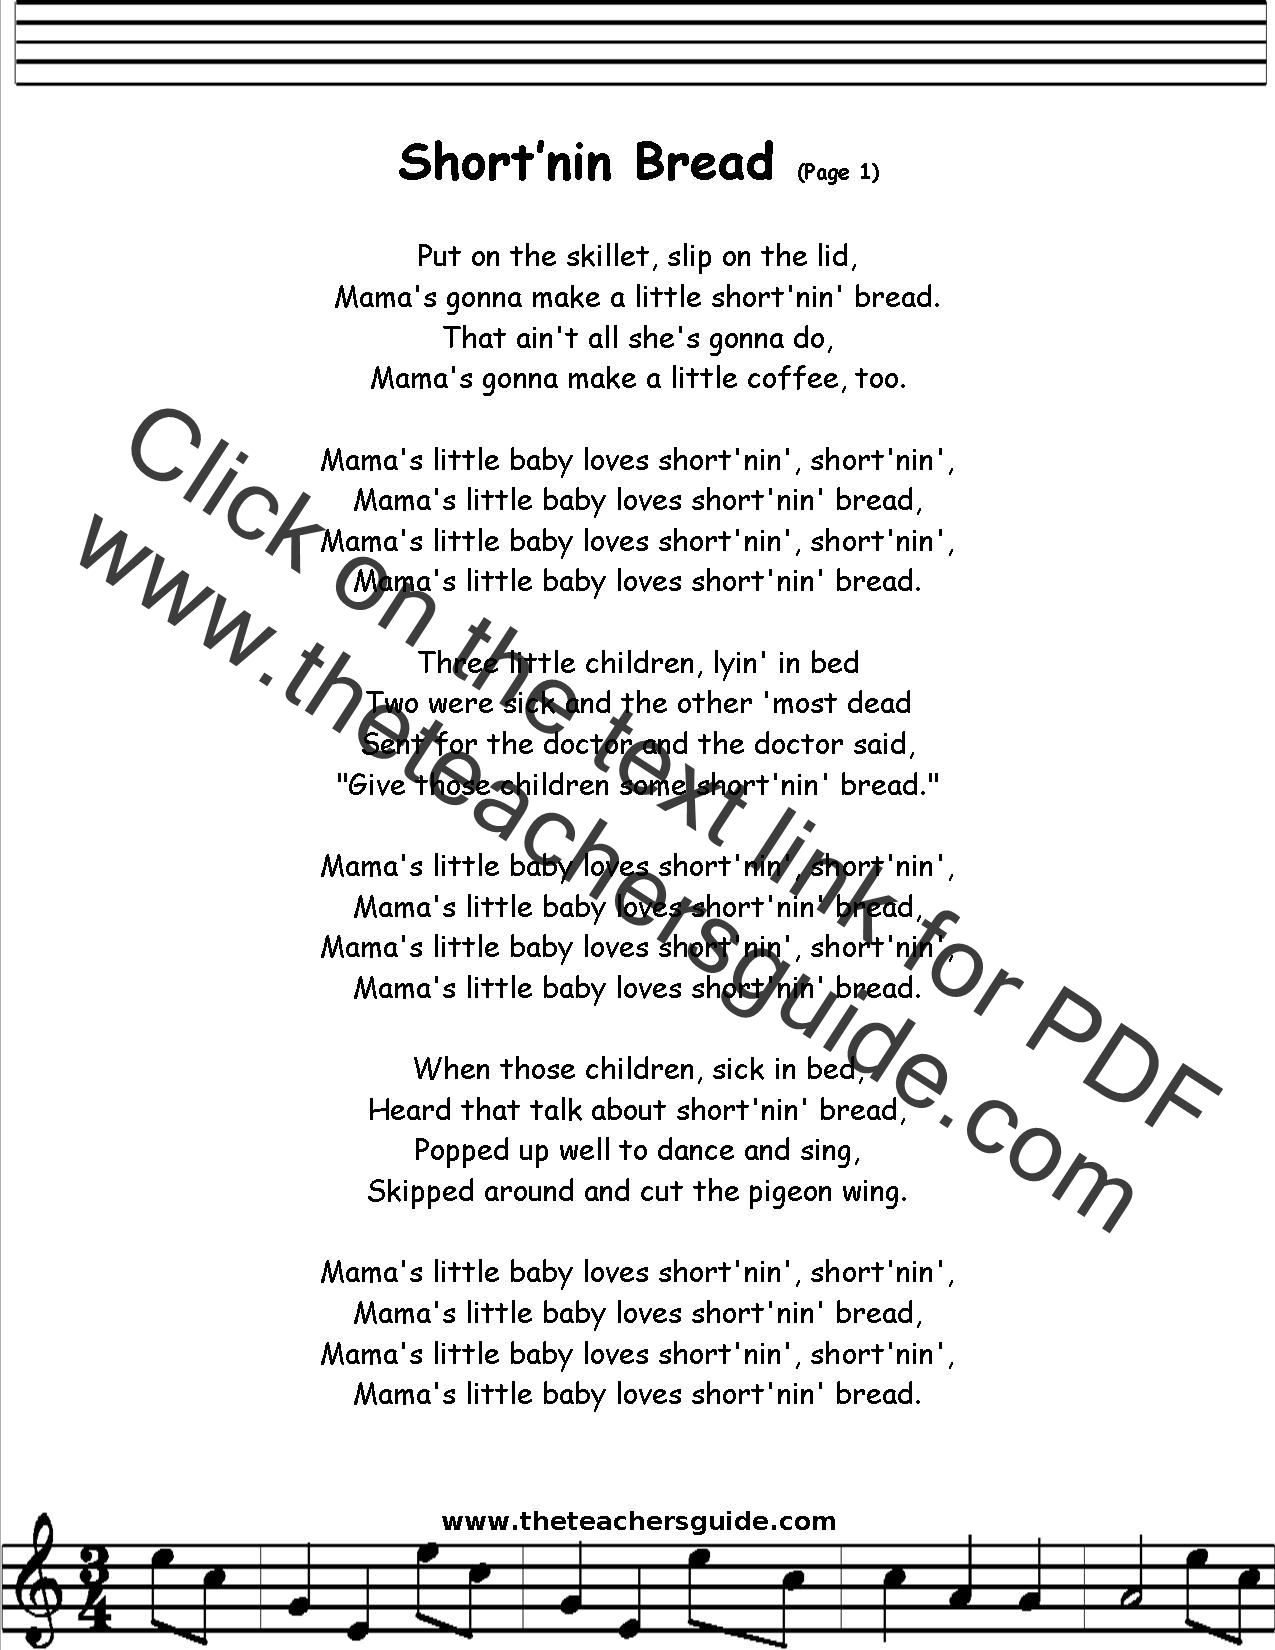 Shortnin Bread Lyrics Printout Midi And Video